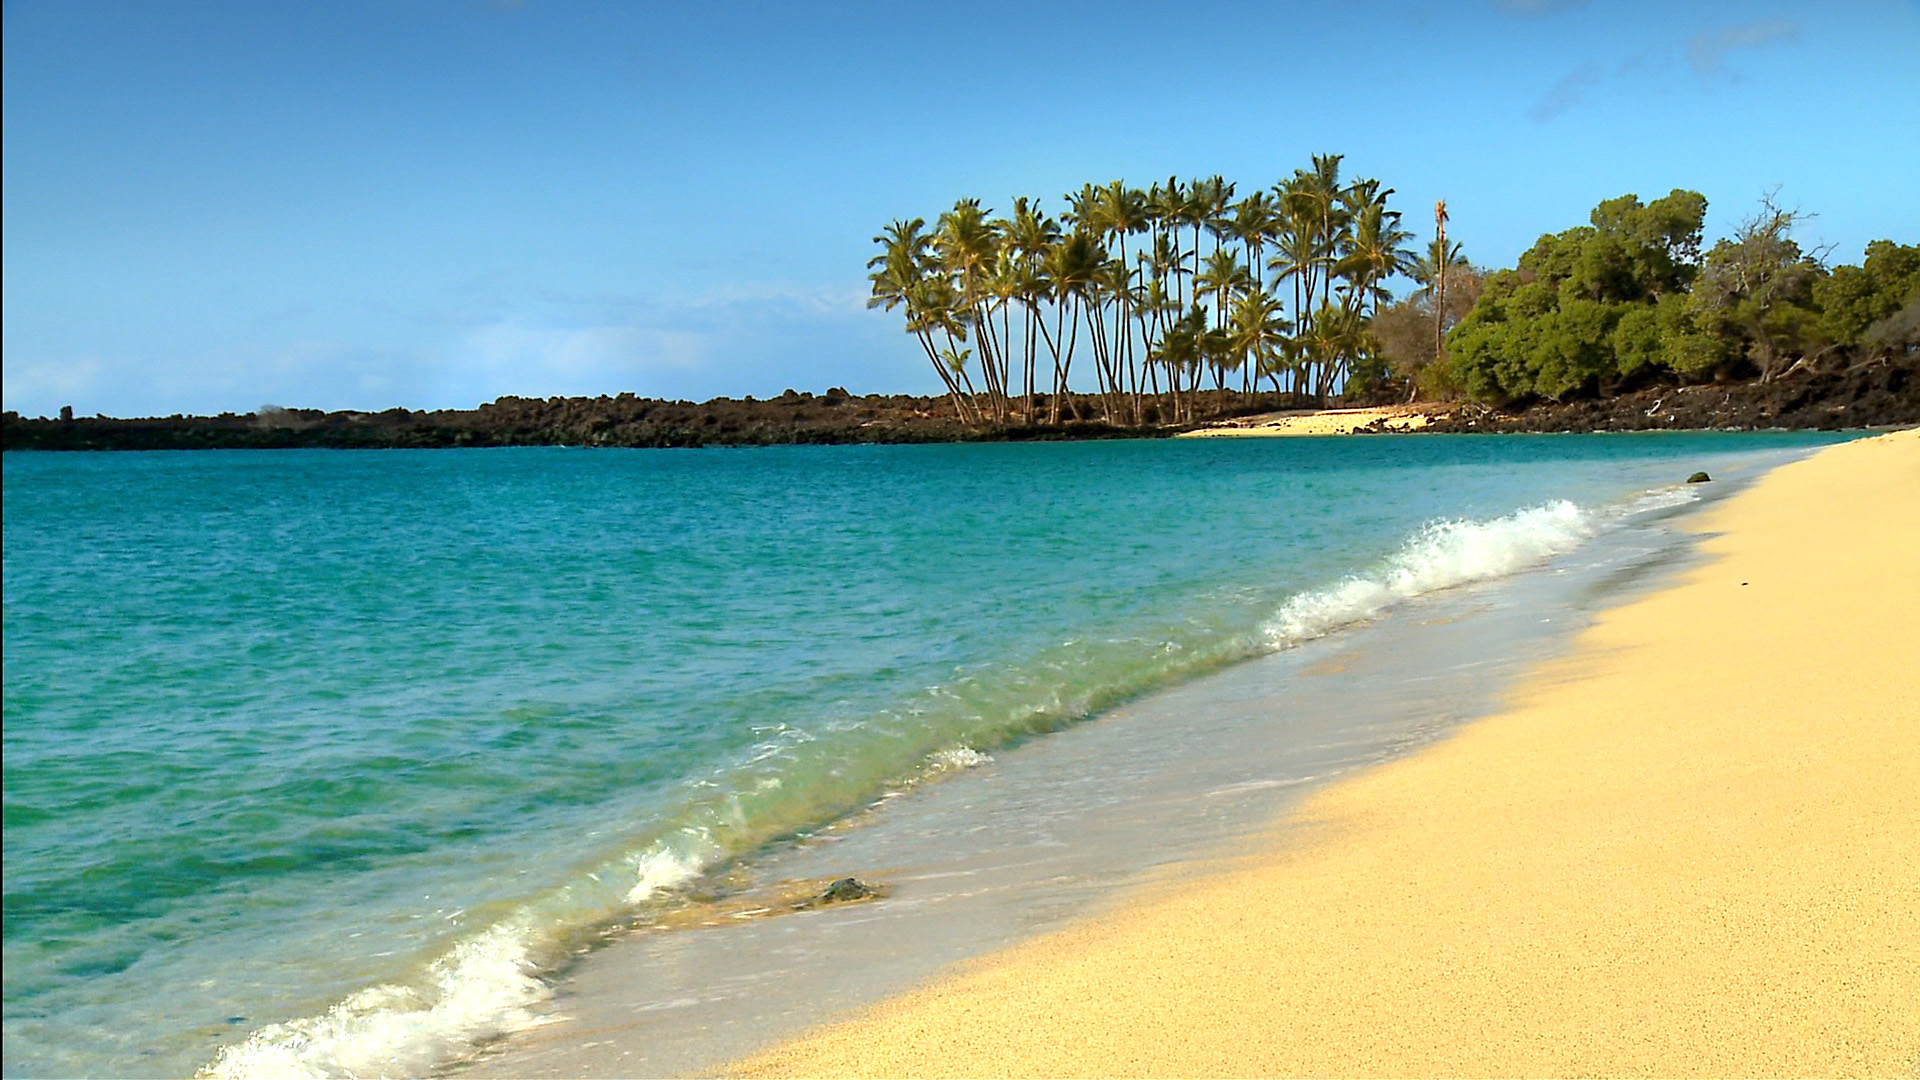 Hawaii Beach #7